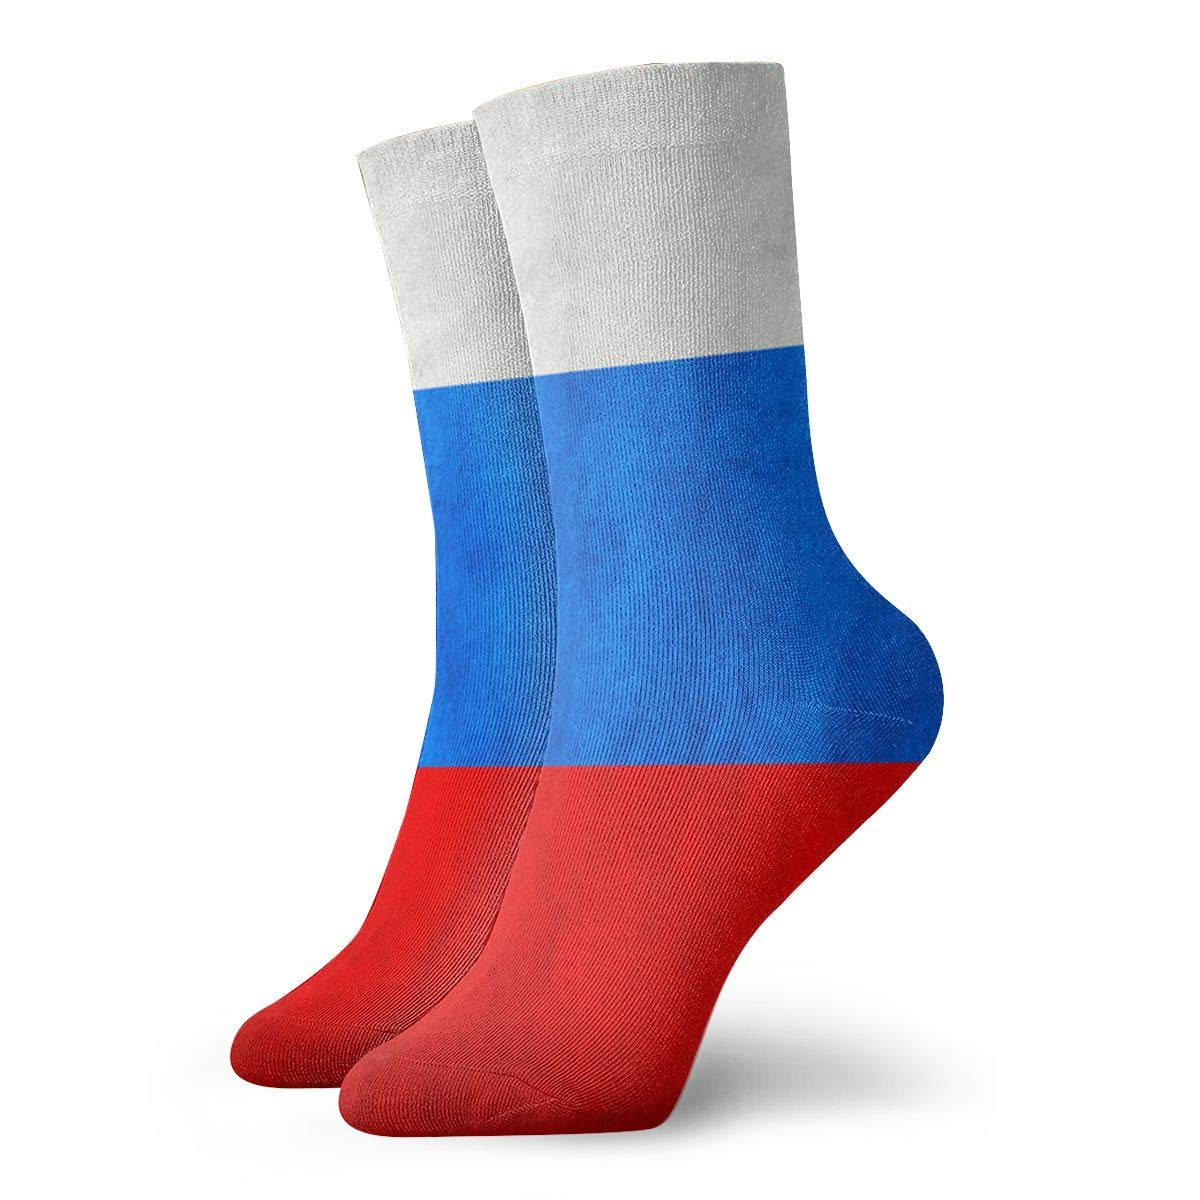 SESY Russia Retro Flag Unisex Crew Socks Short Sports Stocking